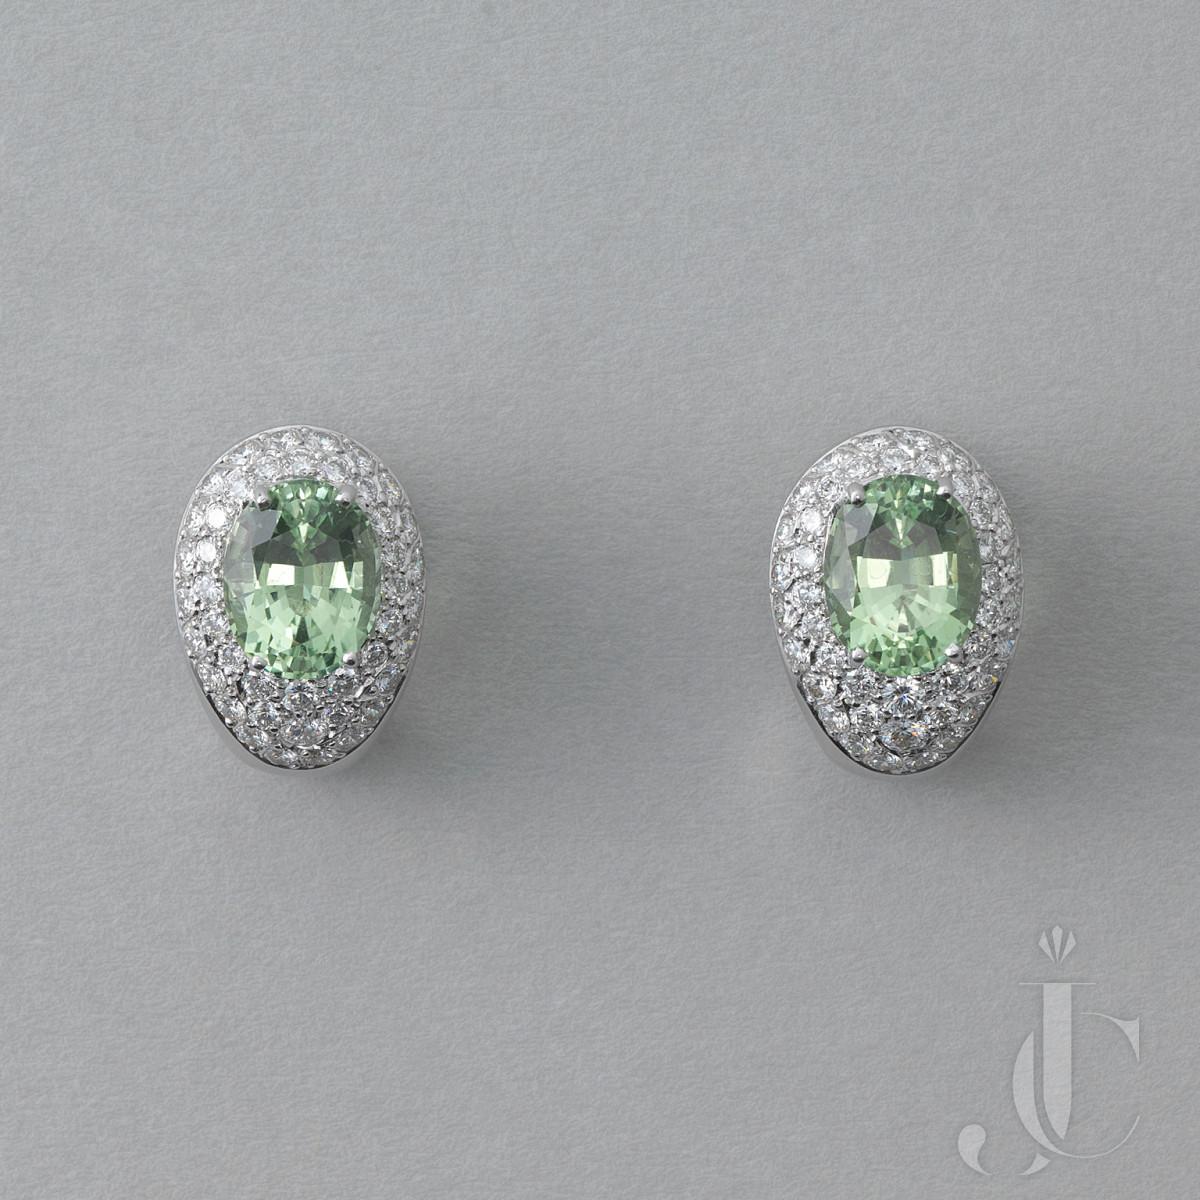 White Gold Diamond and Tourmaline Earrings